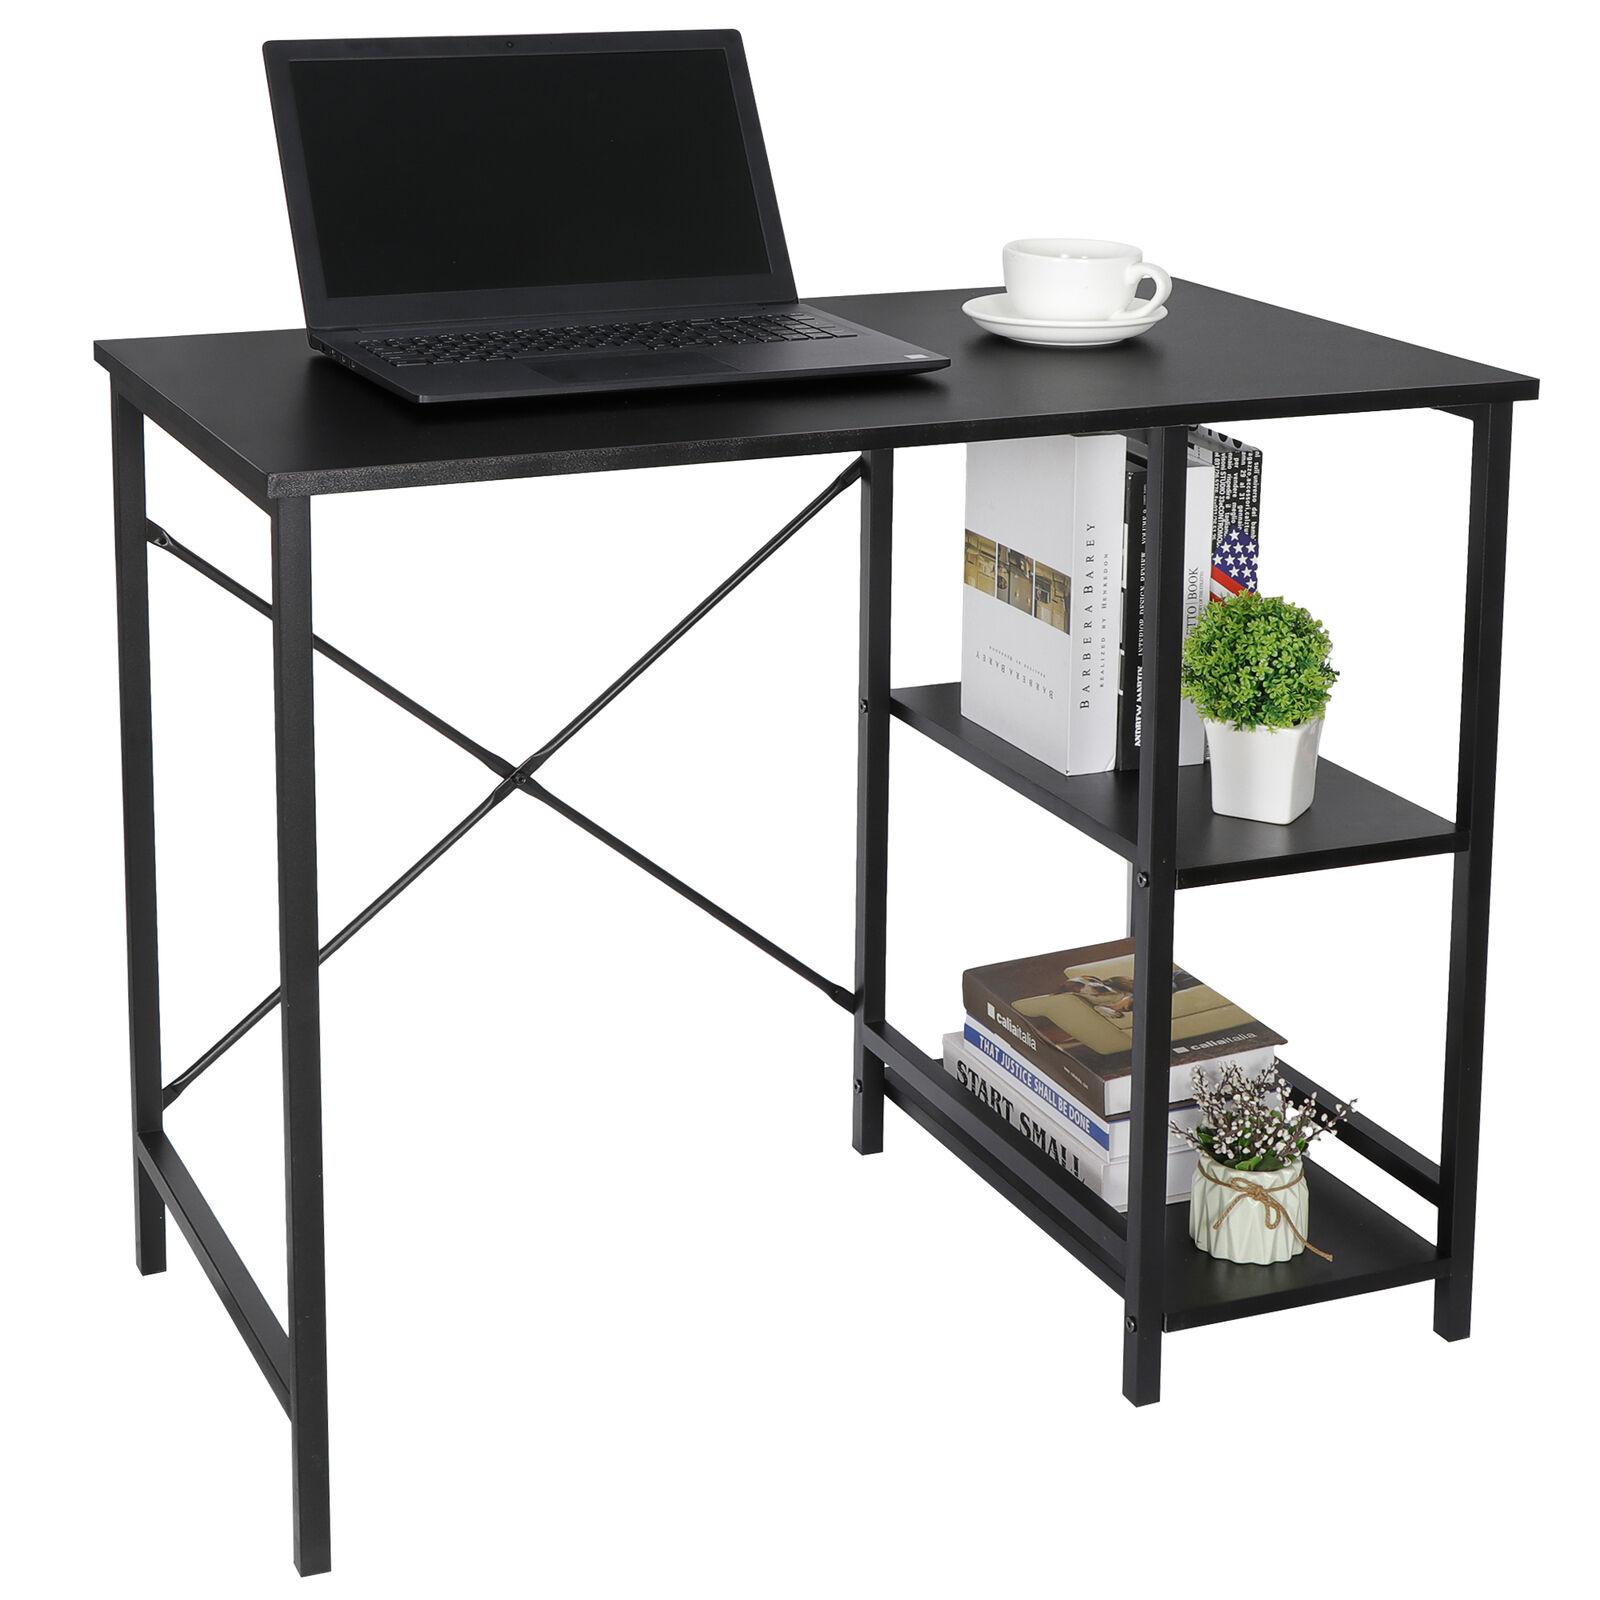 Wood Computer Desk w/2 Tier Shelves Modern Laptop Study Table Home Office Furniture